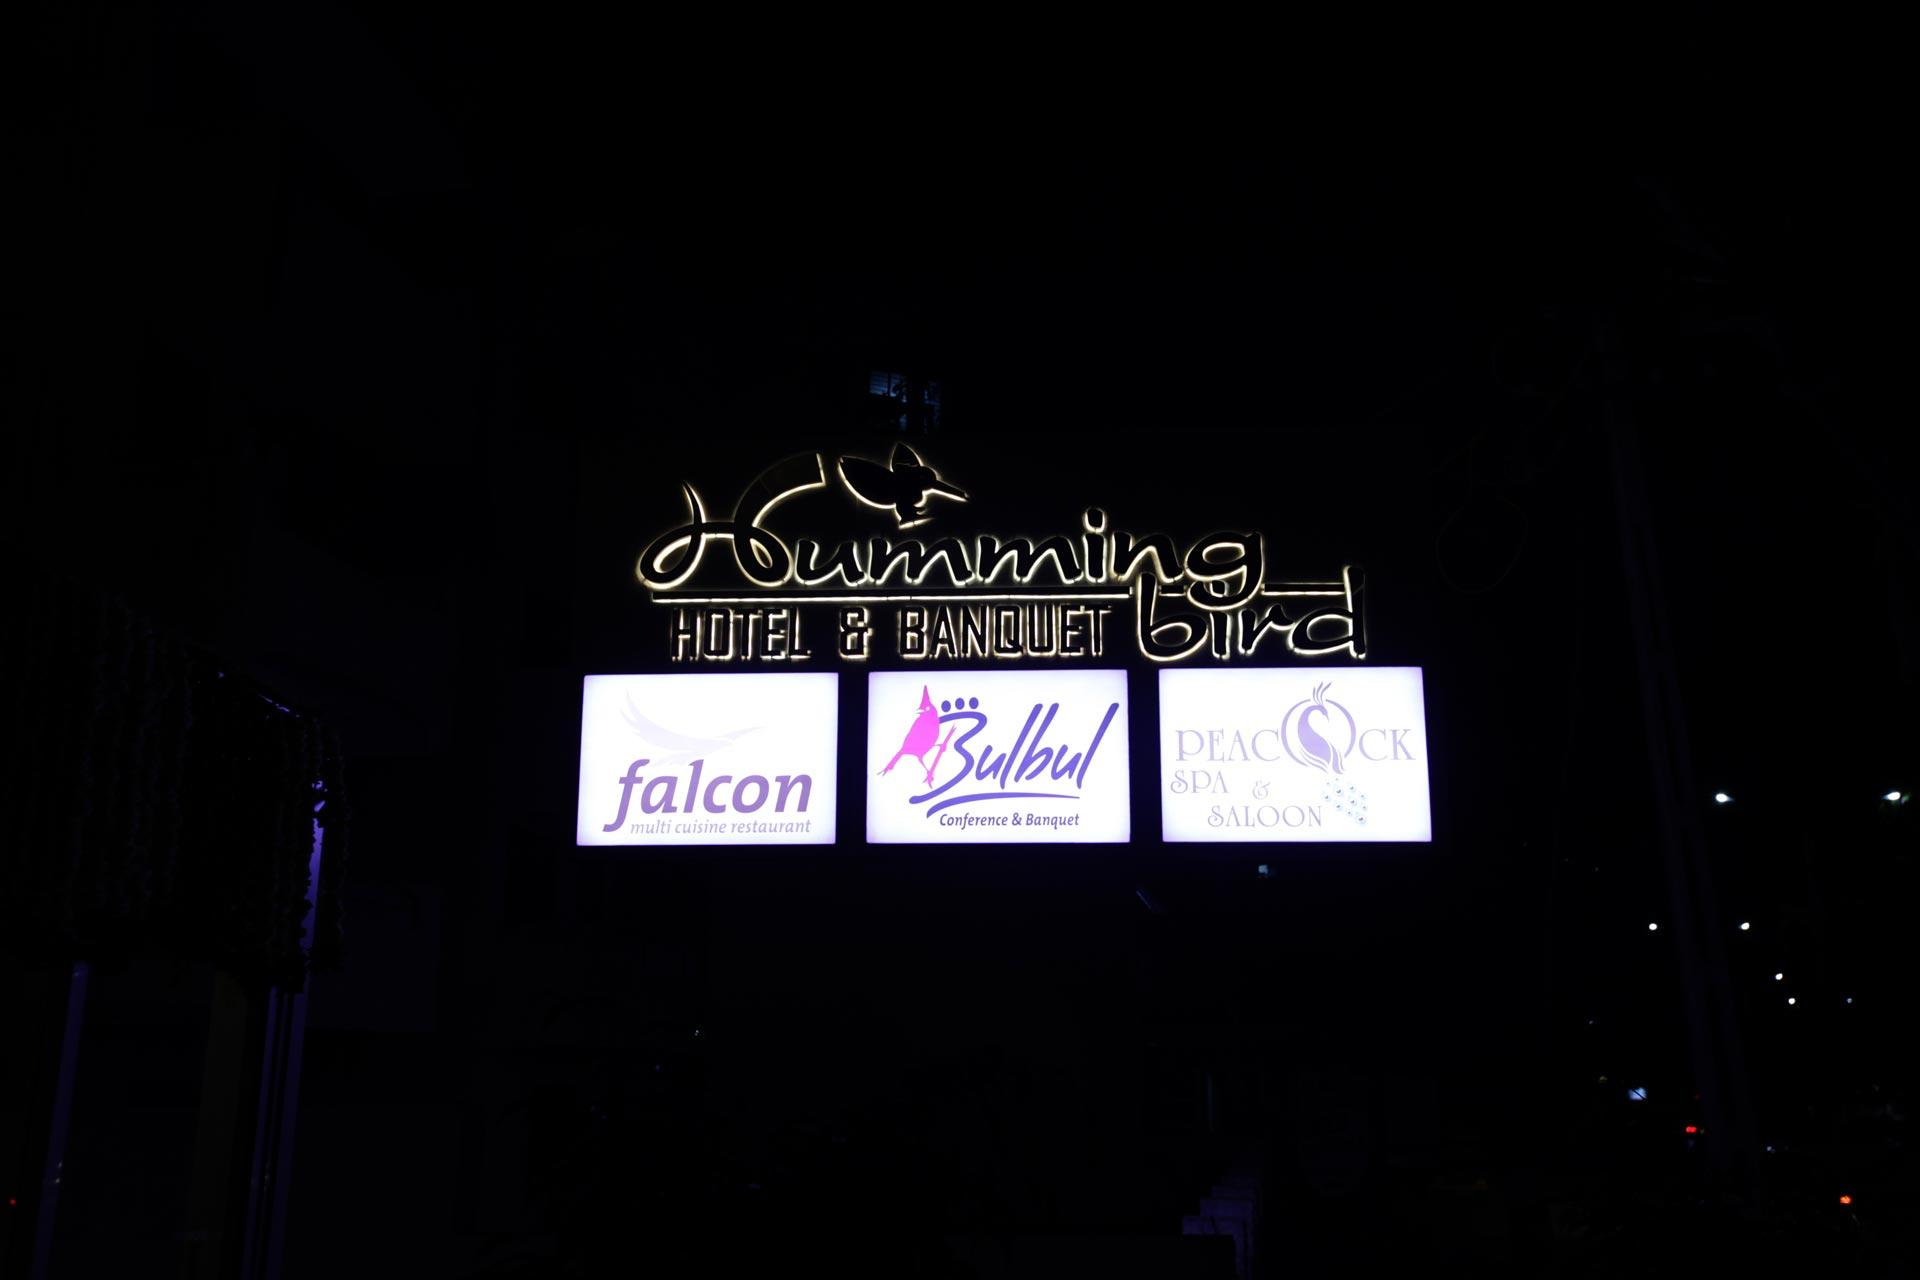 Hummingbird hotel and banquet signange